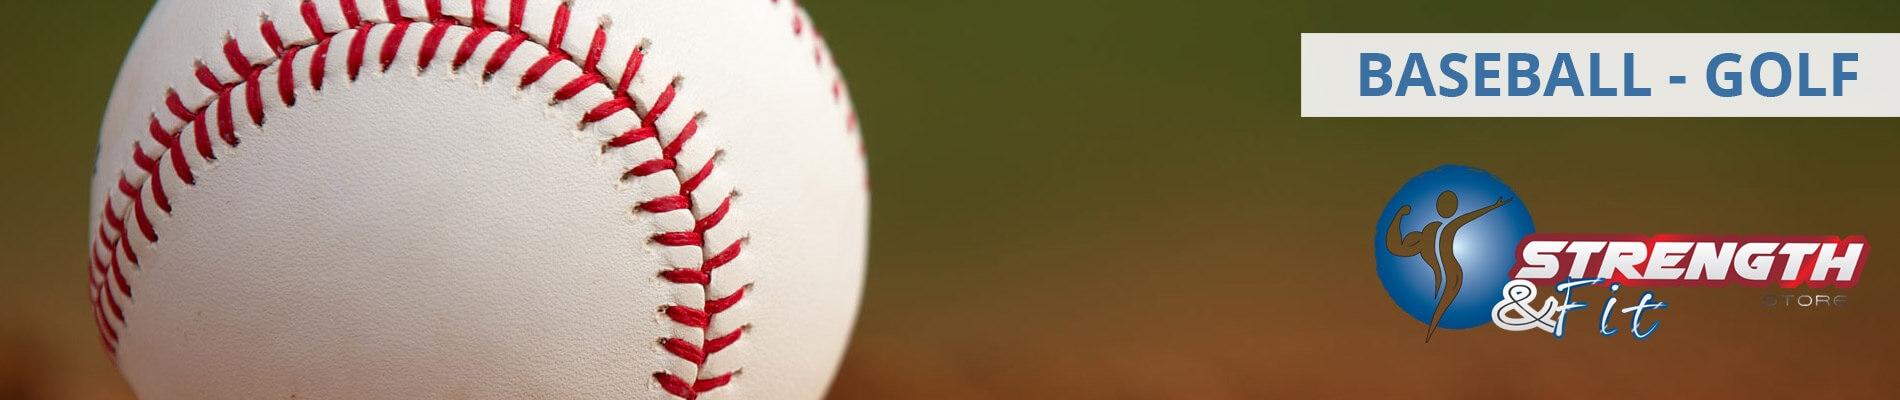 Baseball - Golf - Hockey